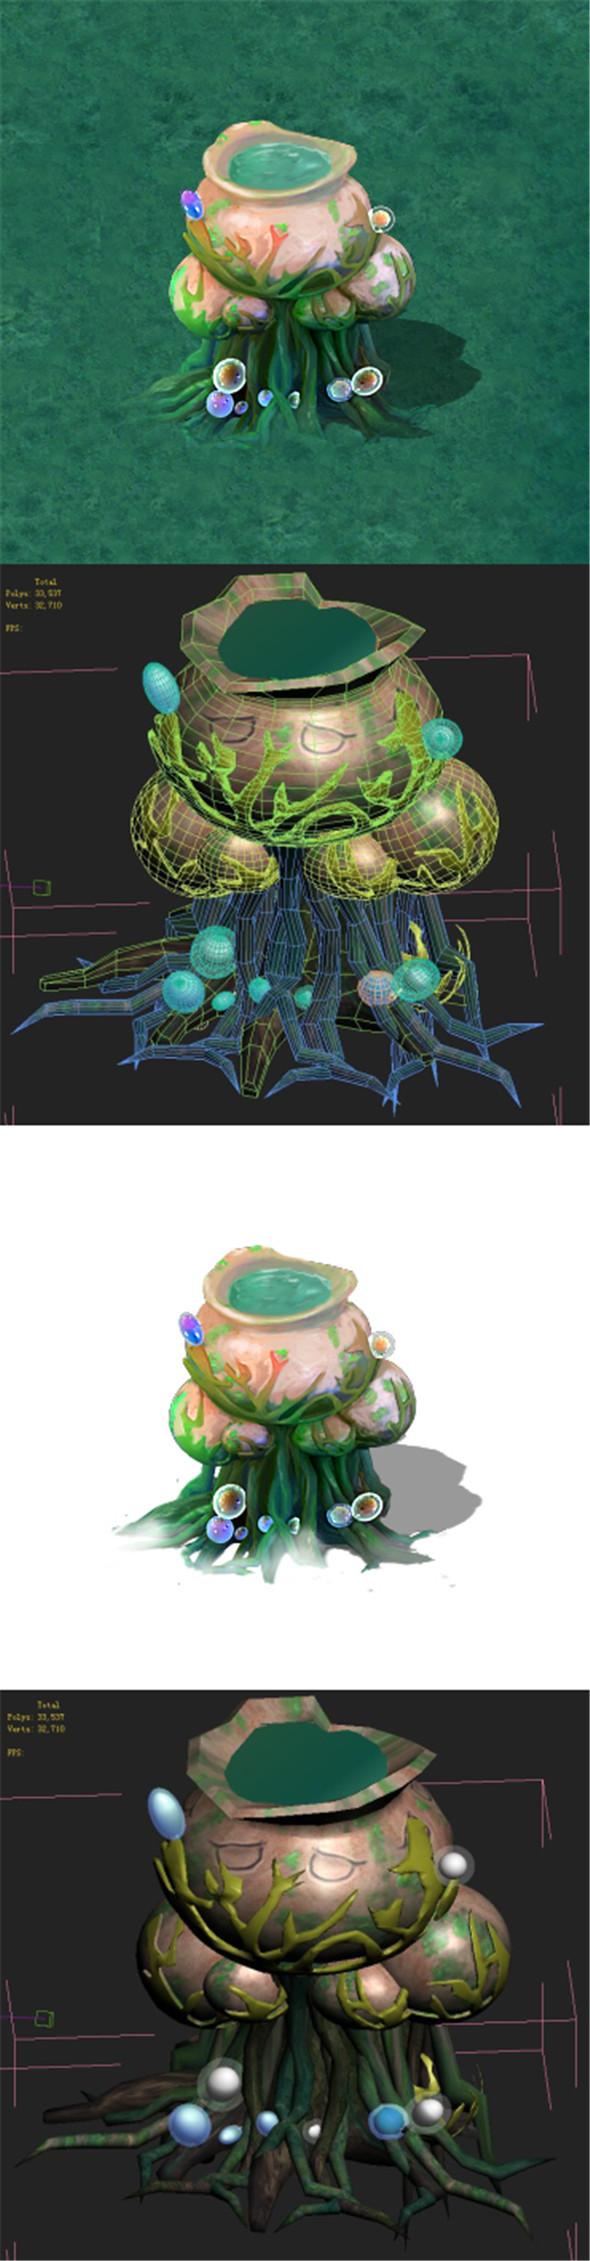 Cartoon version - petrol spores - 3DOcean Item for Sale